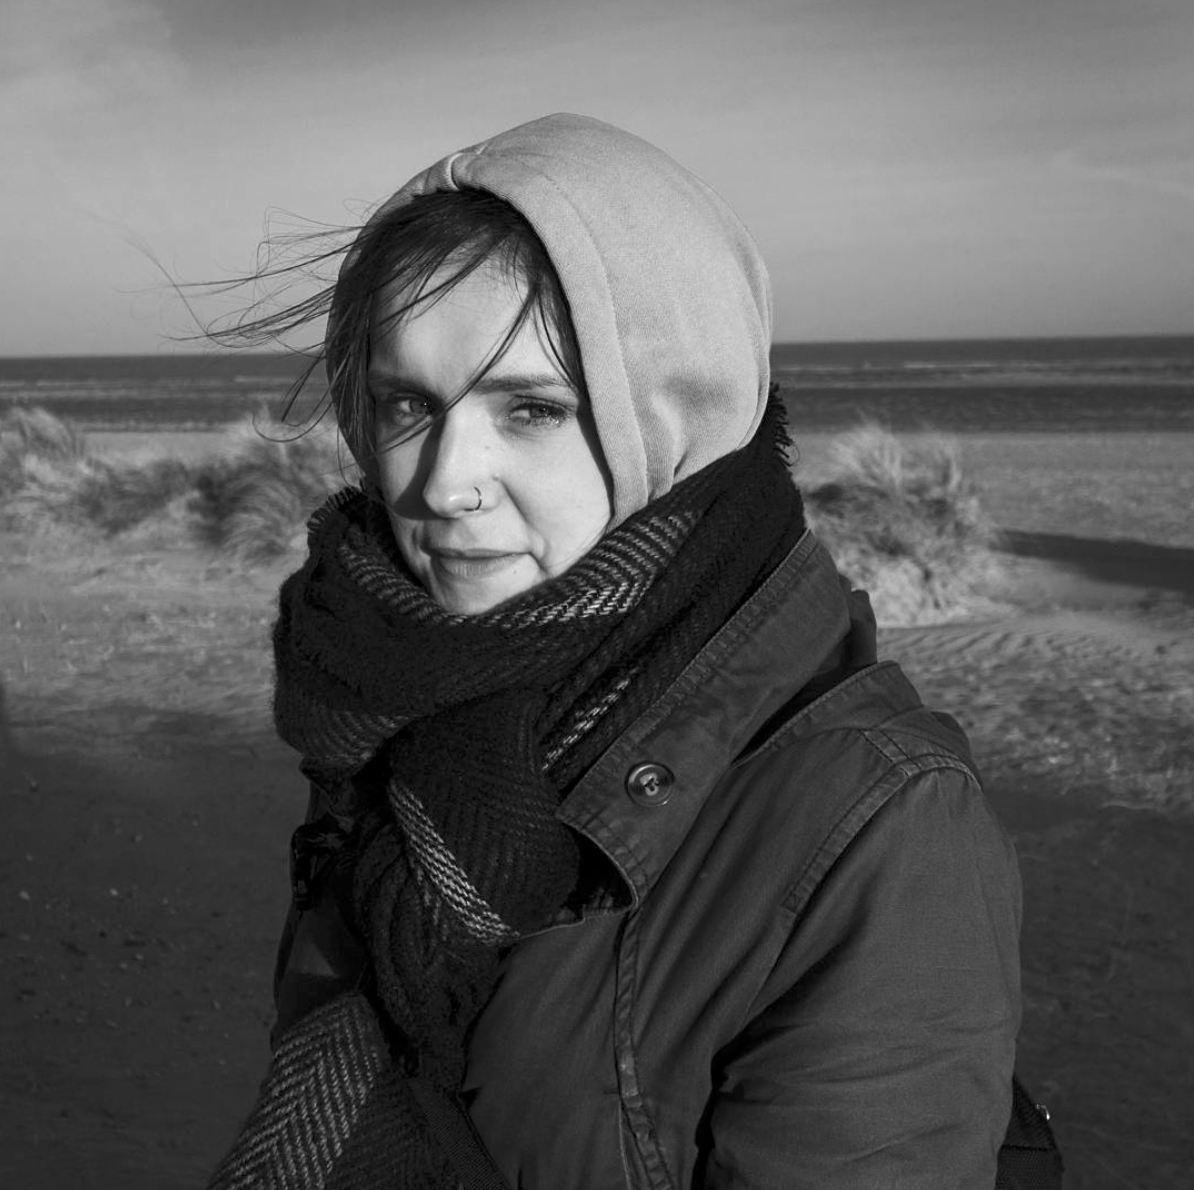 Photo by Joanna Kuncewicz© 2017